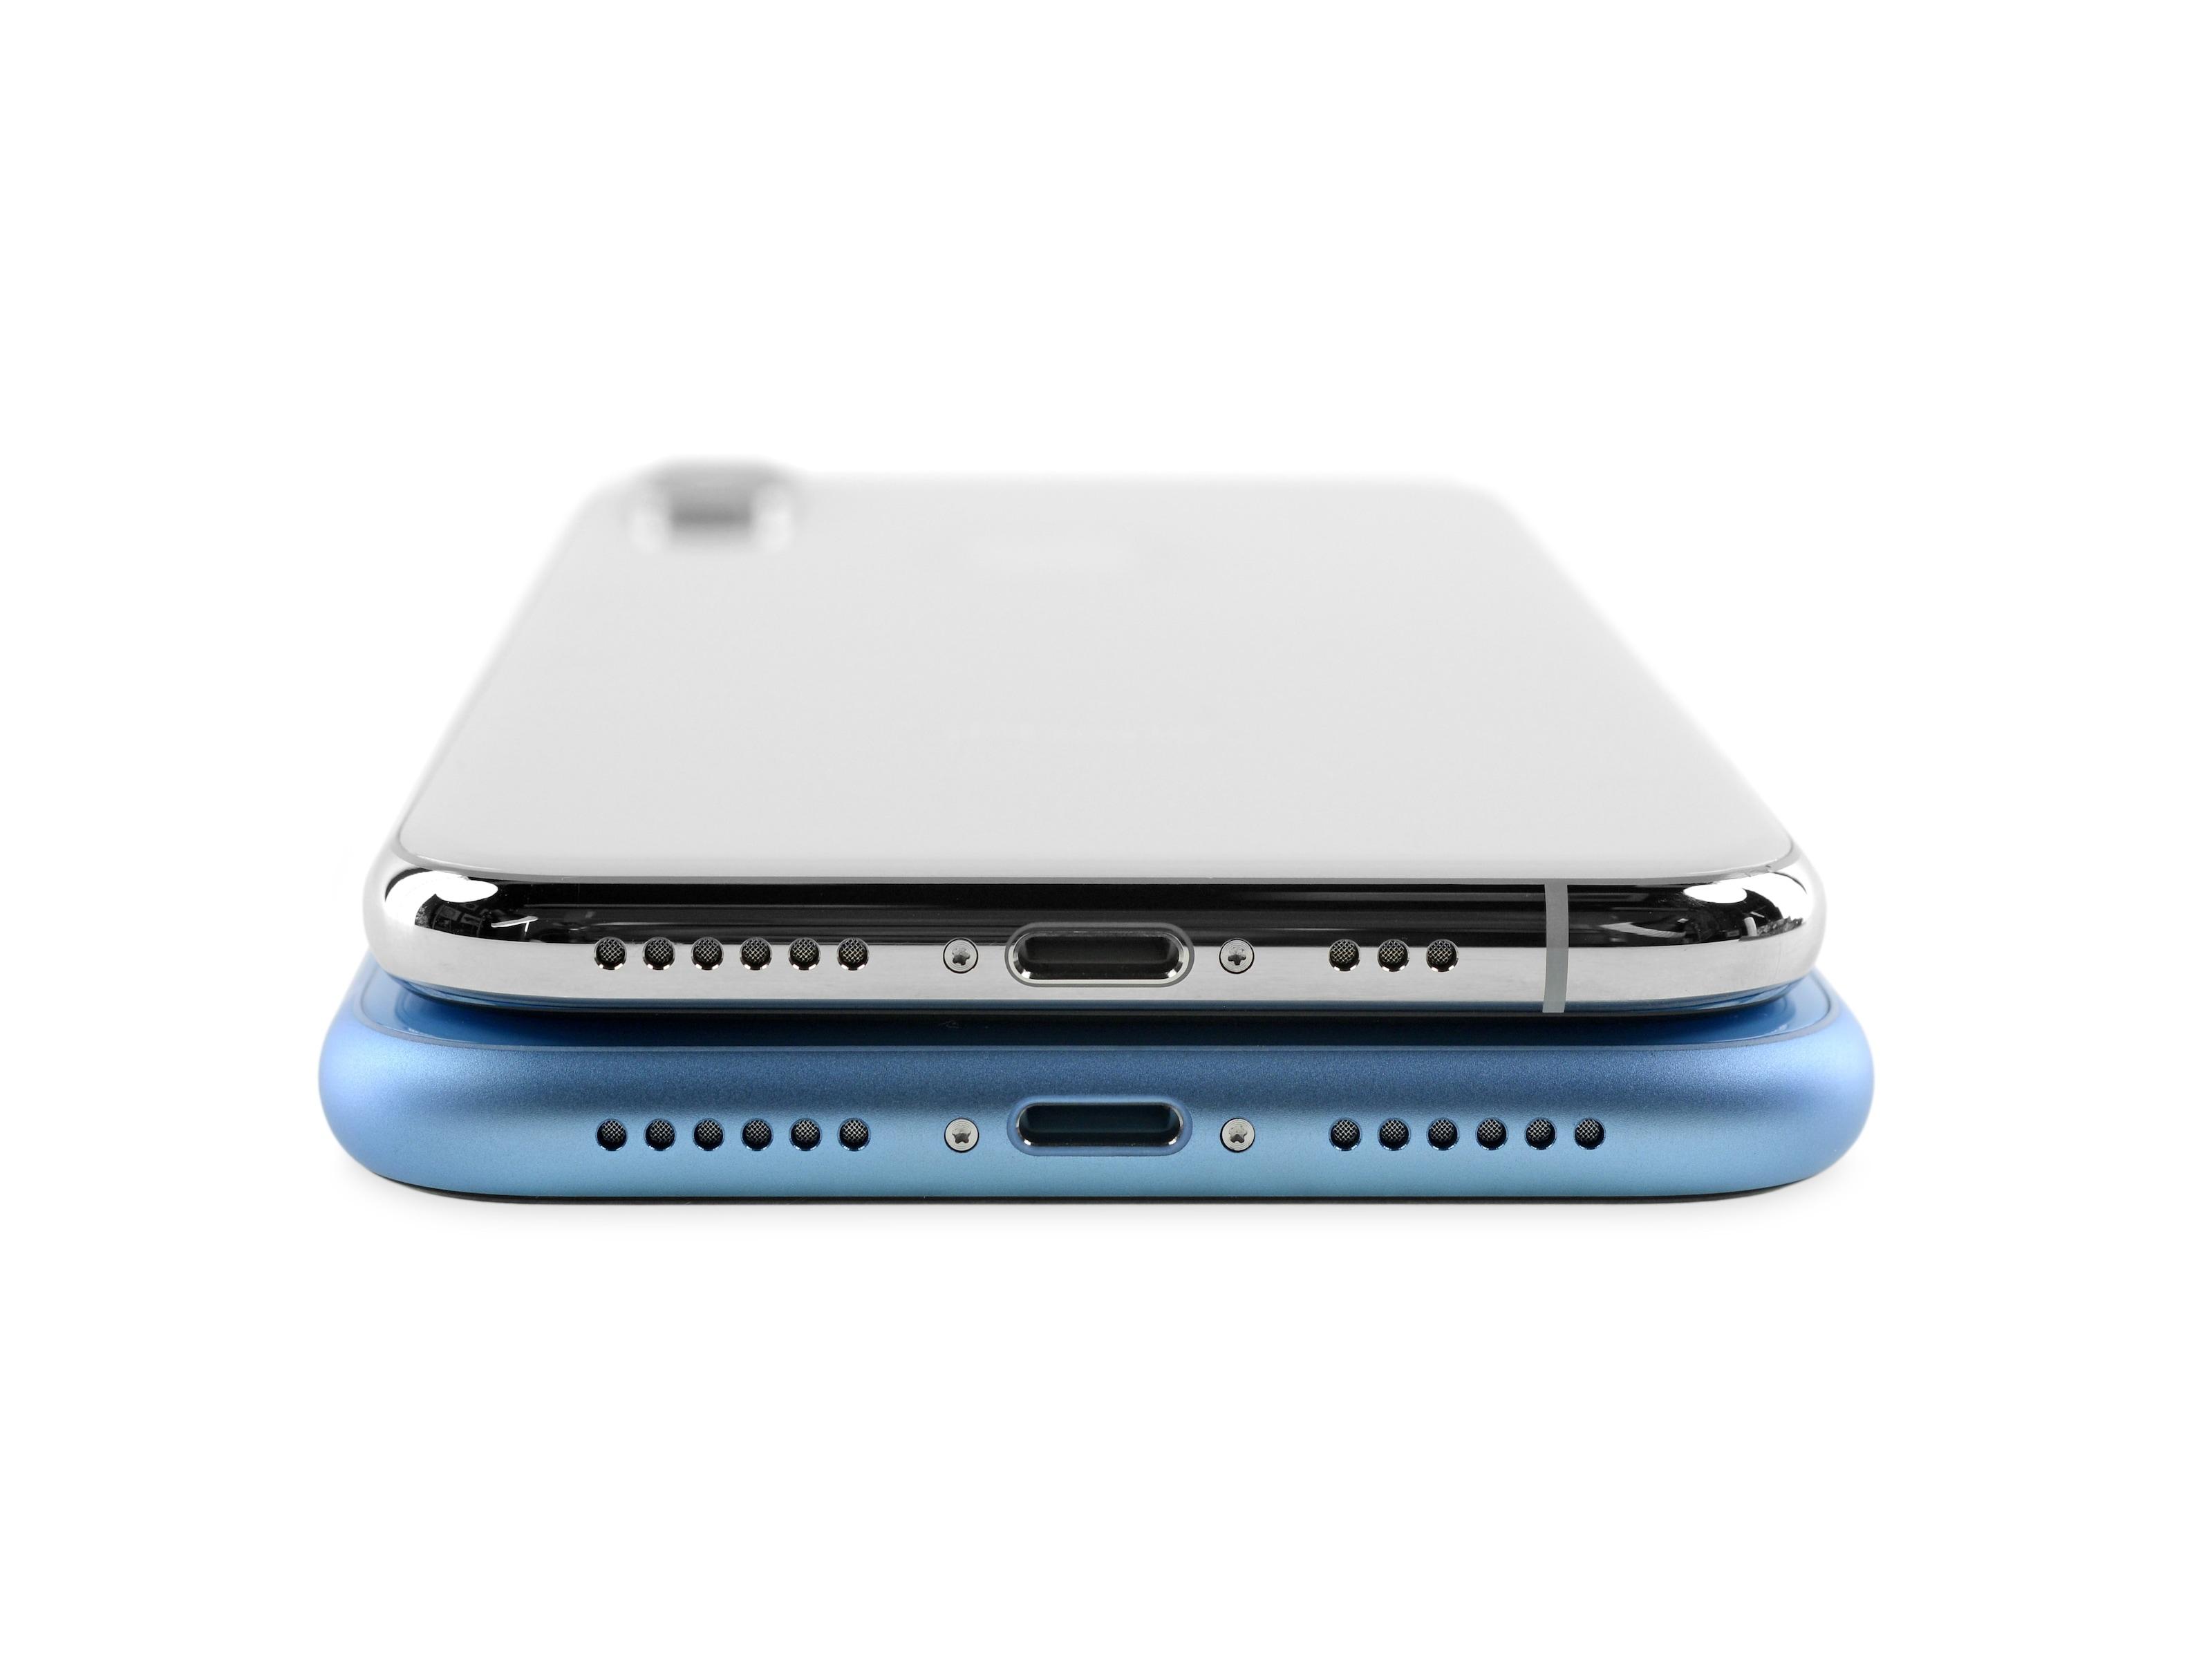 Desmontagem do iPhone XR